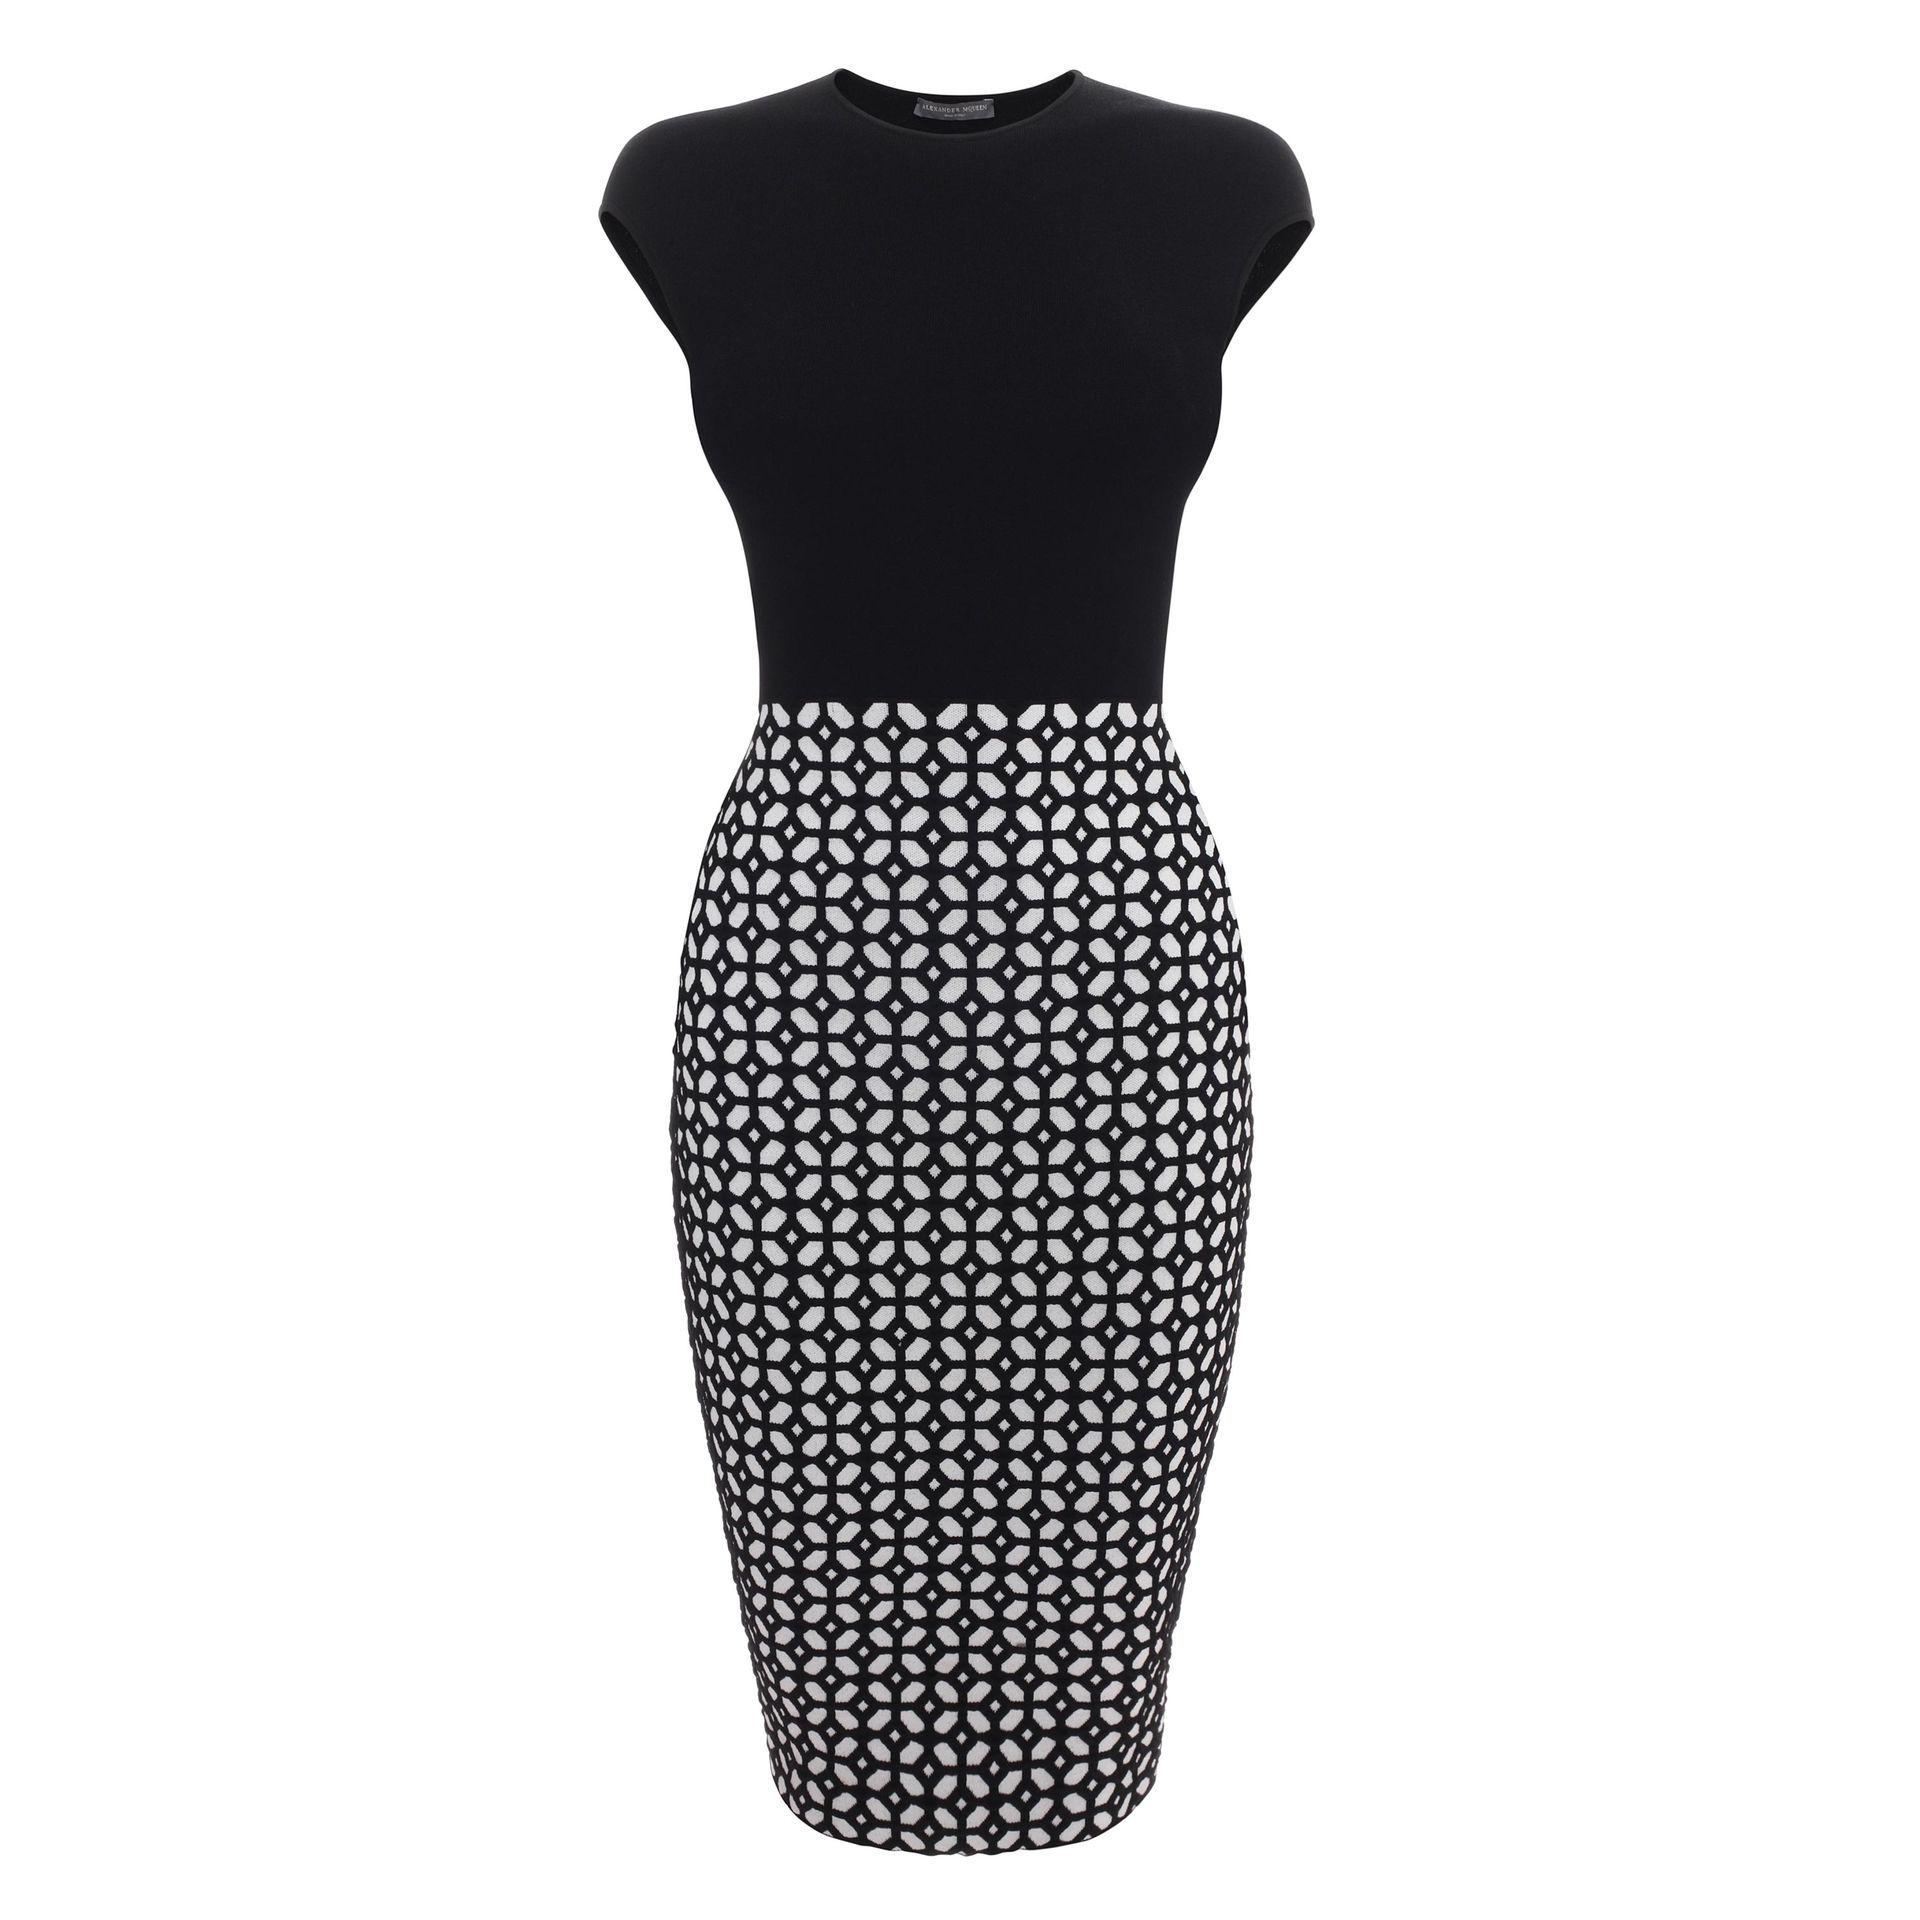 5934405b454 Grid Jacquard Knit Pencil Dress Alexander McQueen